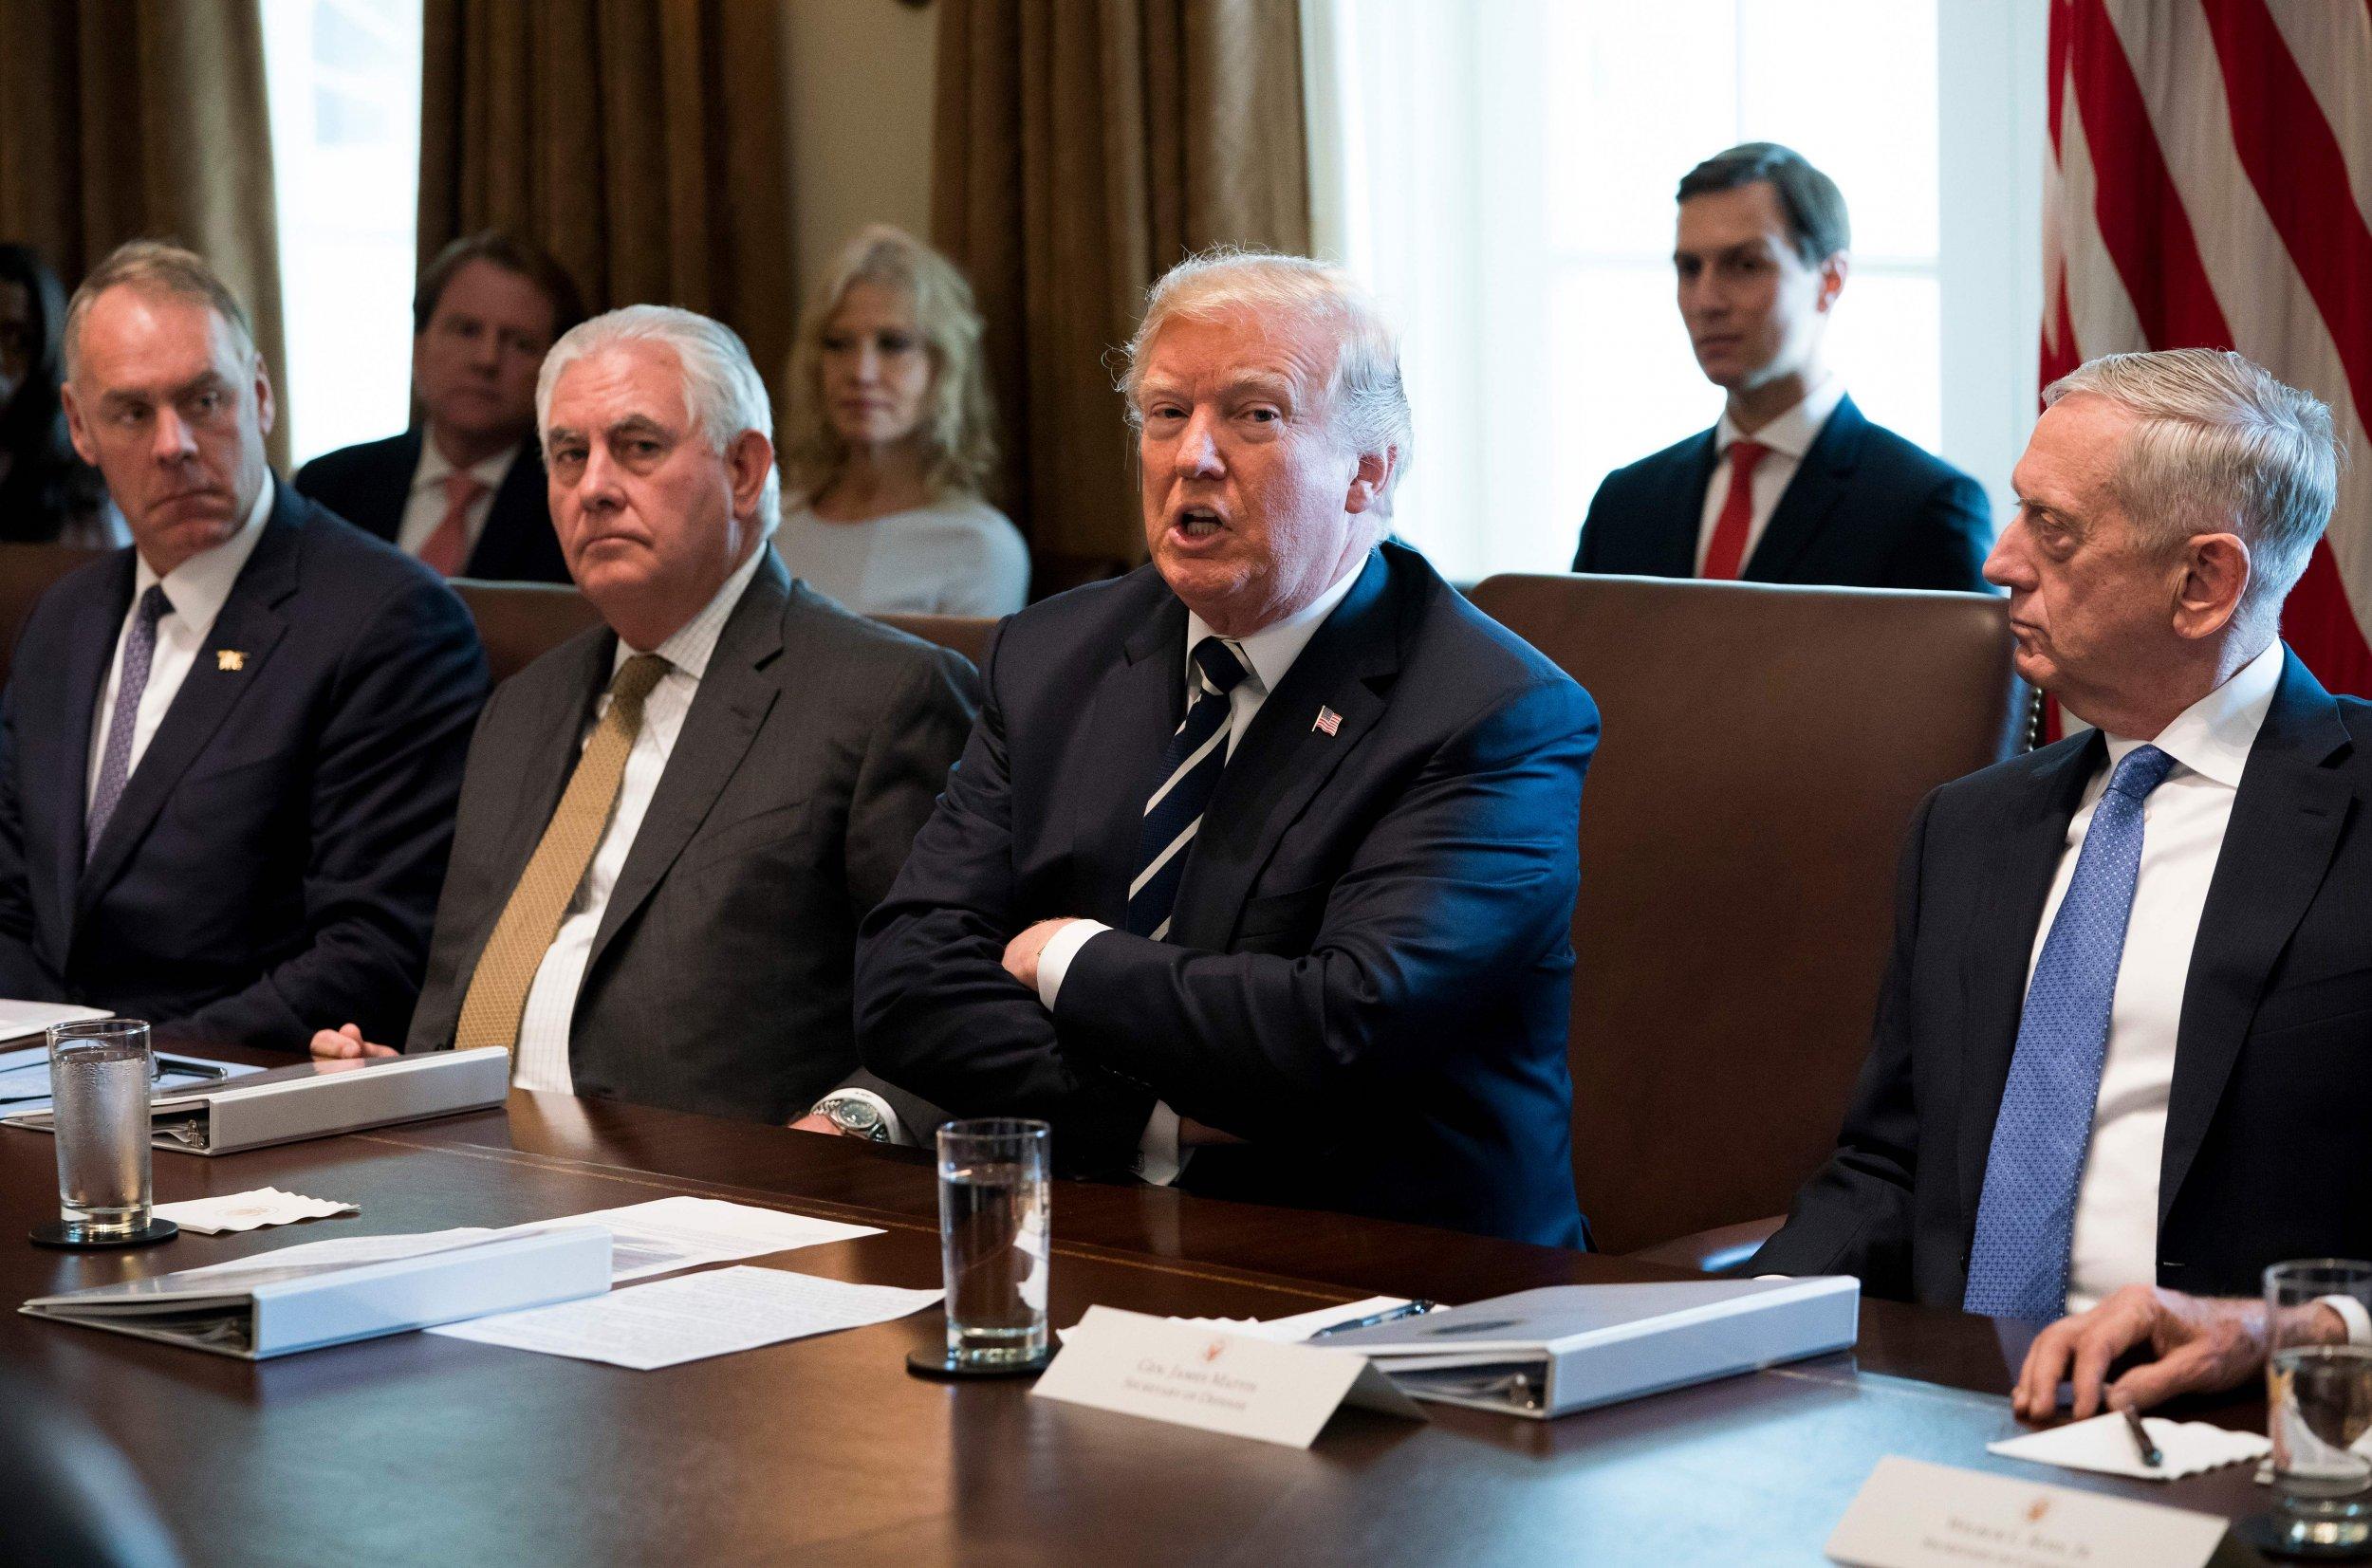 Donald Trum,p, Rex Tillerson, Jim Mattis